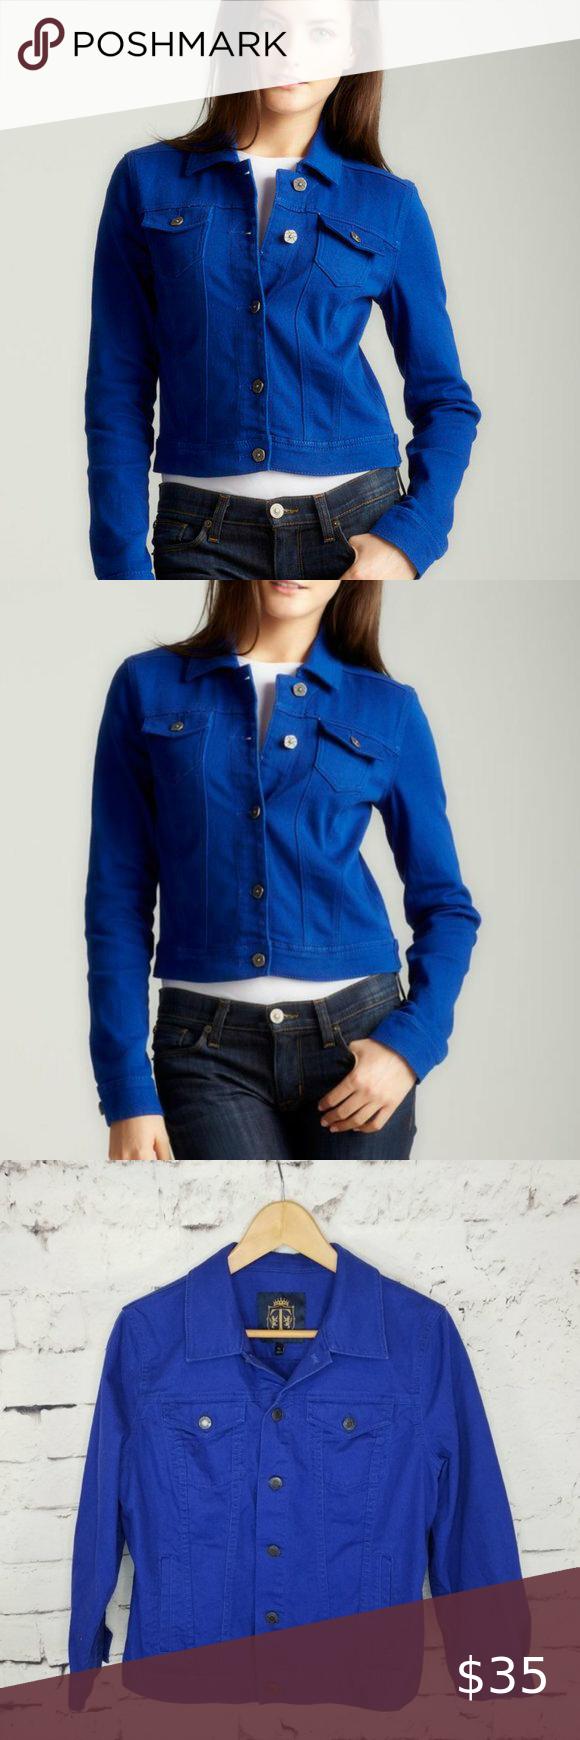 Talbots Royal Blue Denim Jacket Size Medium Petite Blue Denim Jacket Blue Denim Denim Jacket [ 1740 x 580 Pixel ]